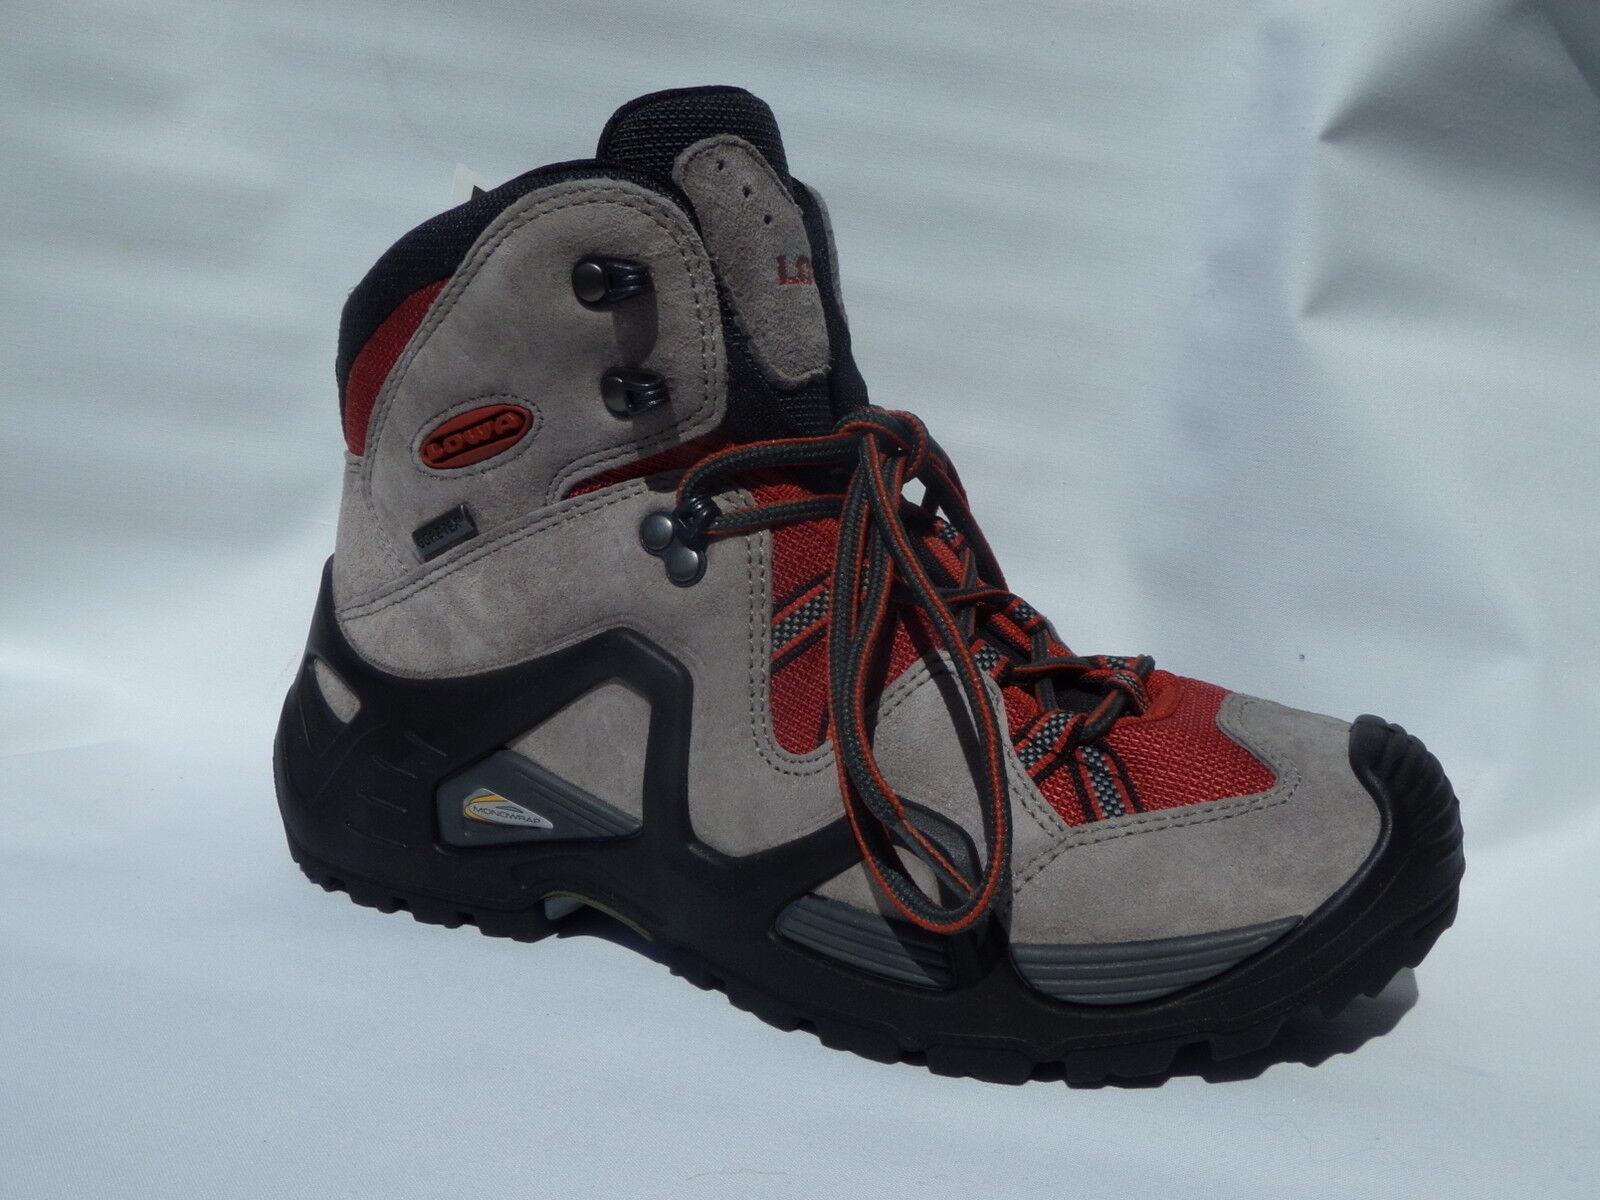 Lowa Zephyr GTX mid gris terracota noté trekking profundidad 4,5  37 1 3  tienda en linea